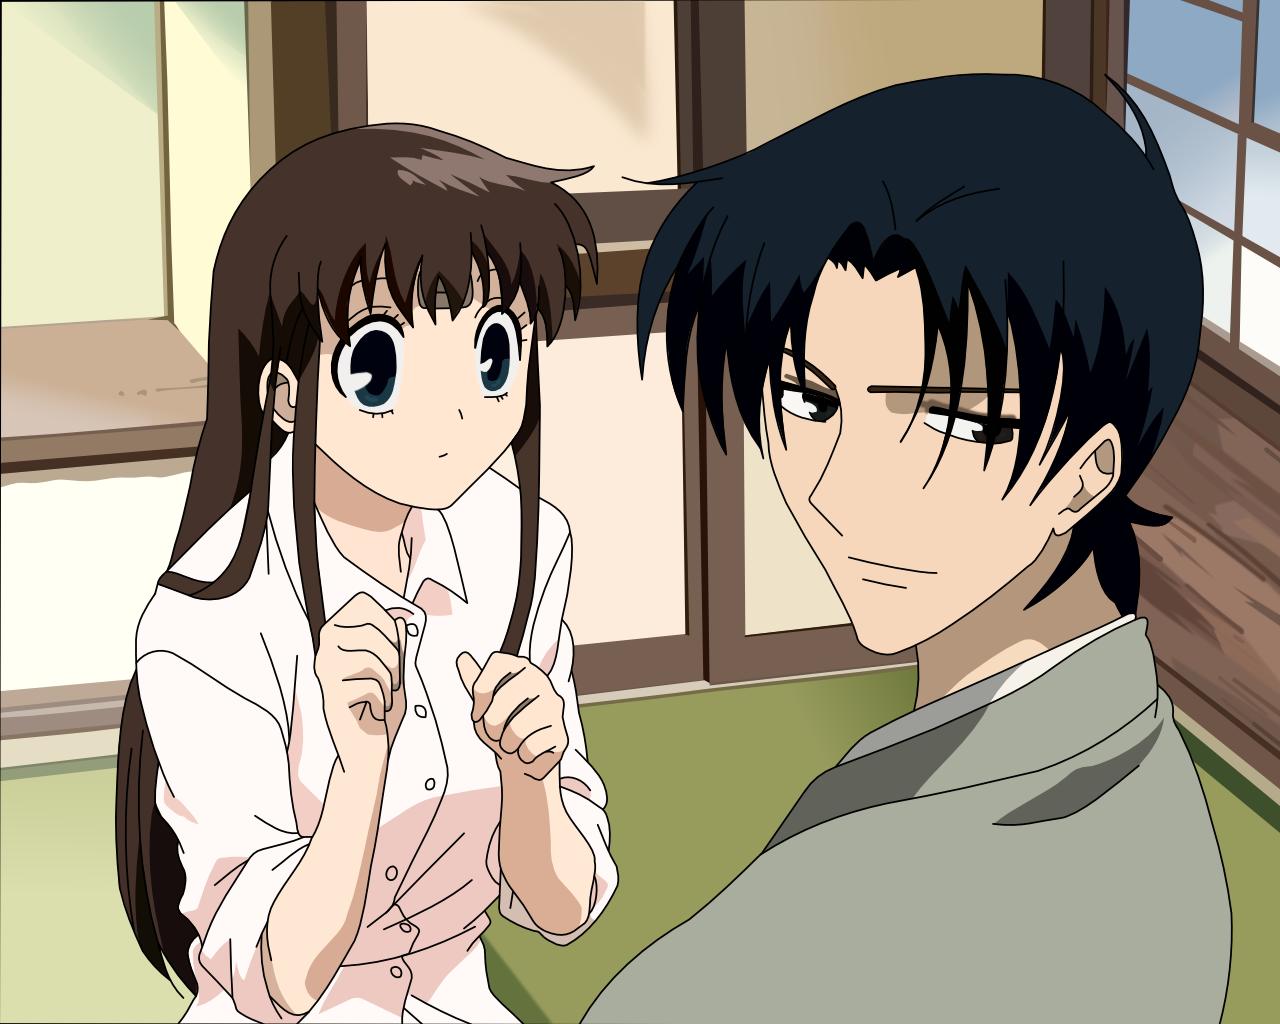 Kyo Sohma And Tohru Honda Fanfiction Tohru and Shigure by T...